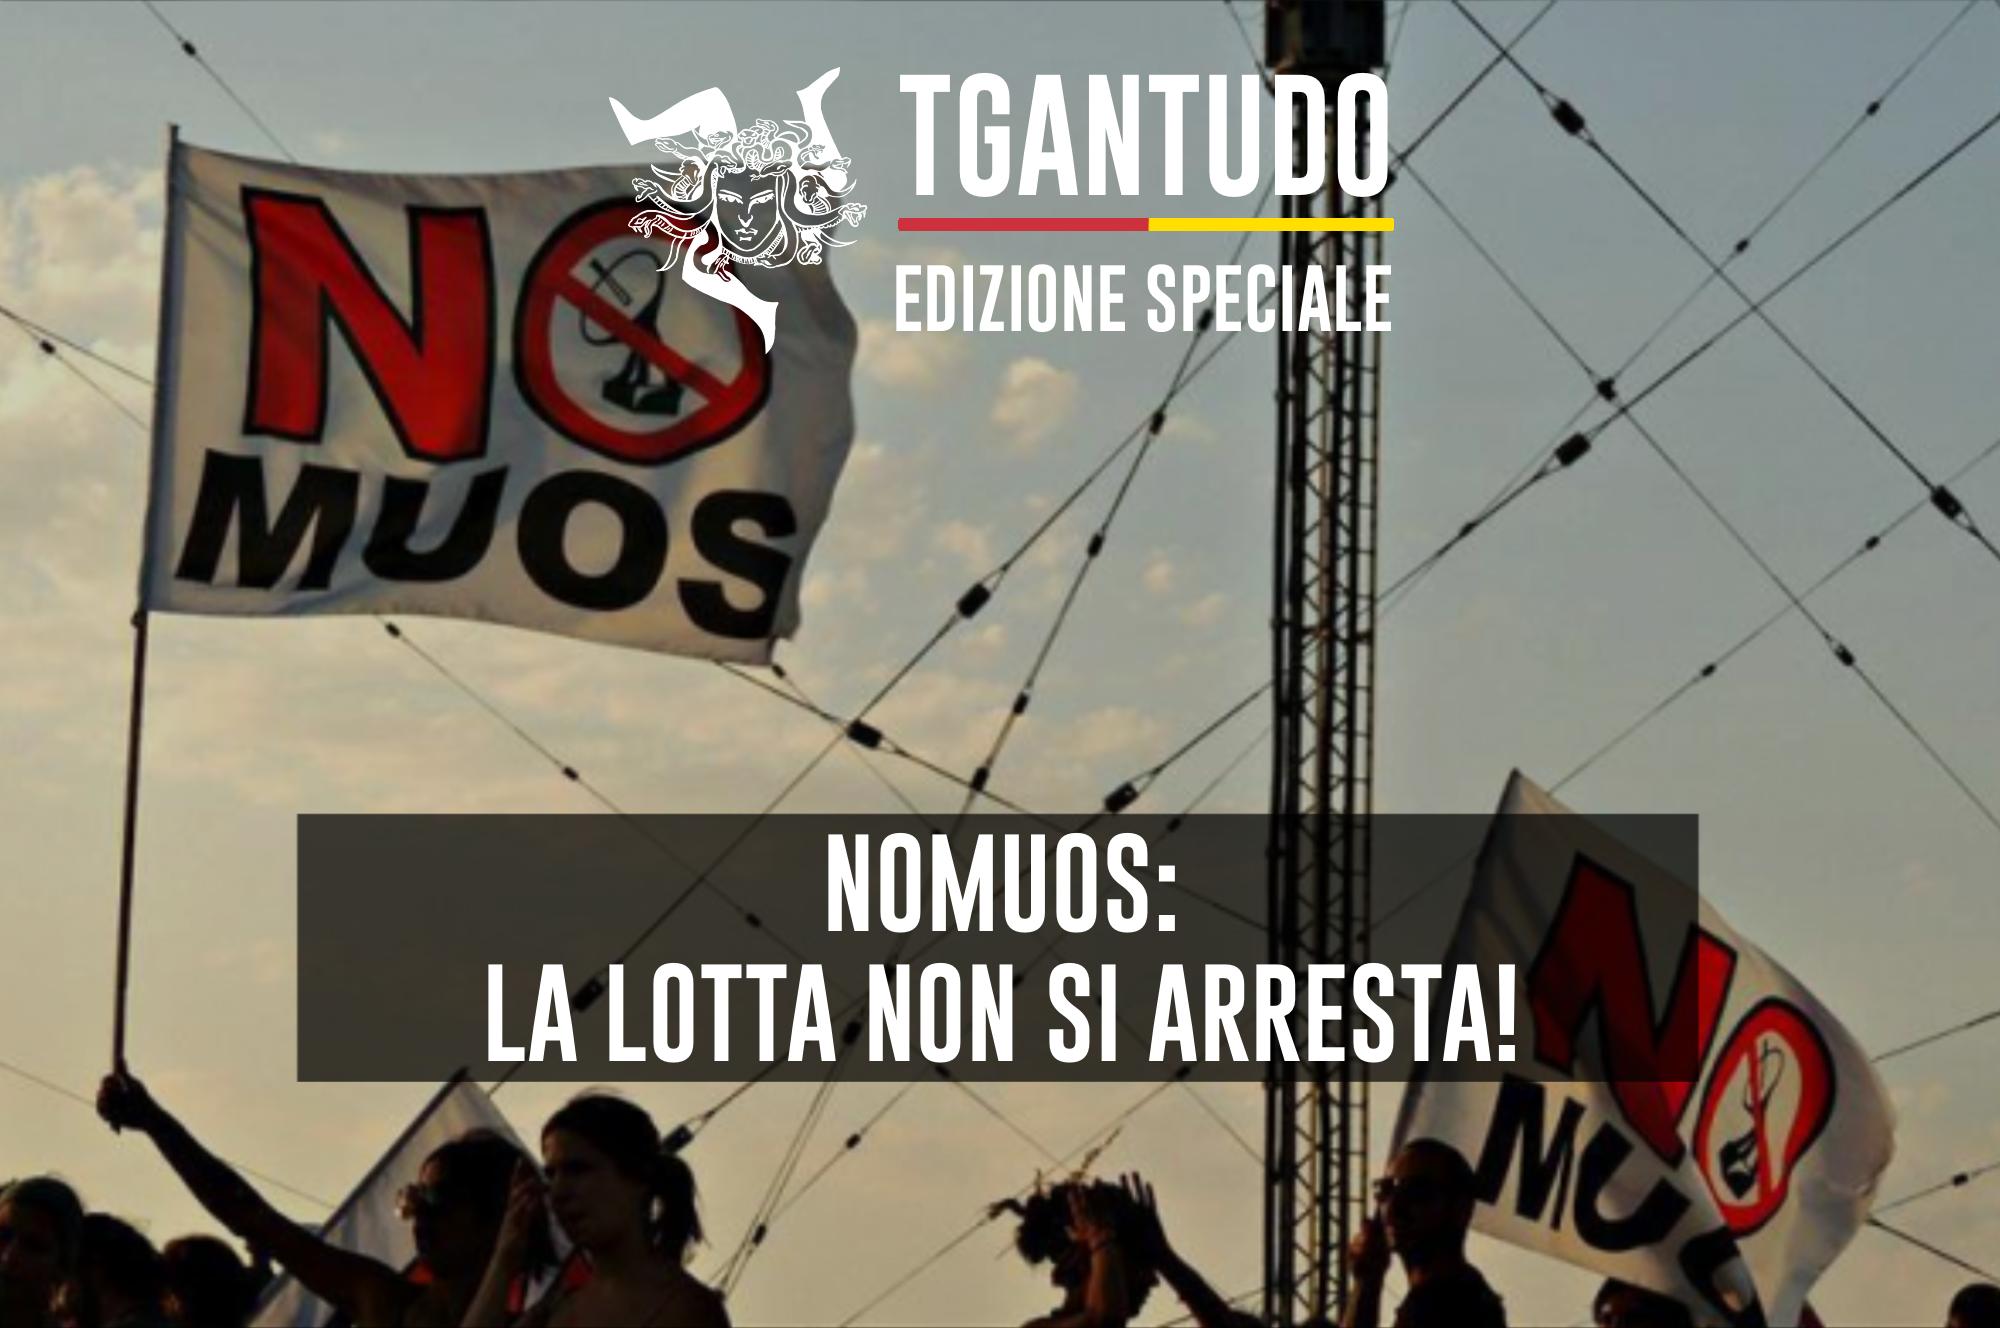 TGAntudo – NoMuos: la lotta non si arresta!